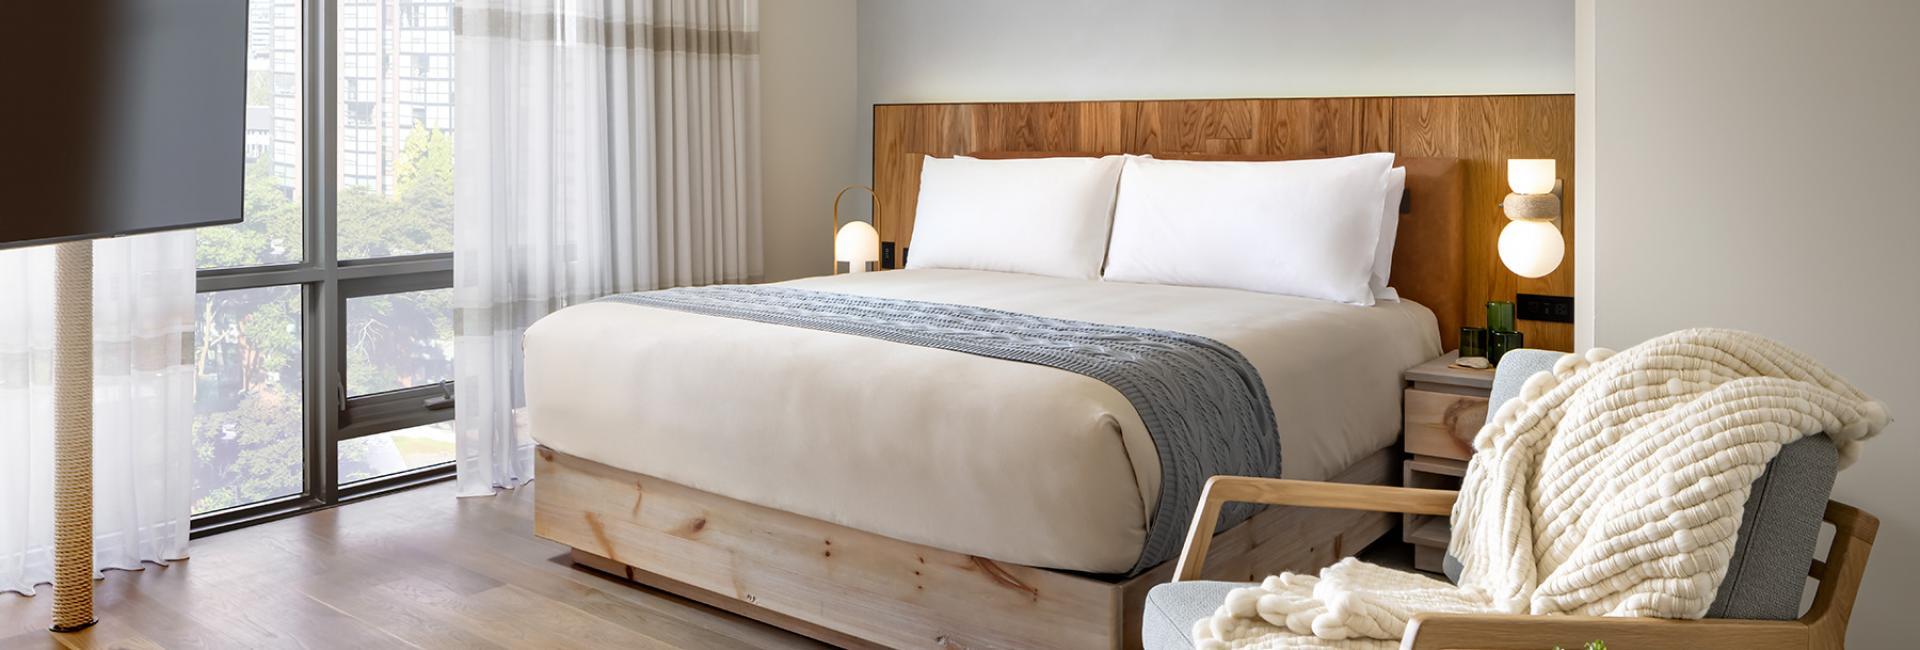 Skyline Flat Bed